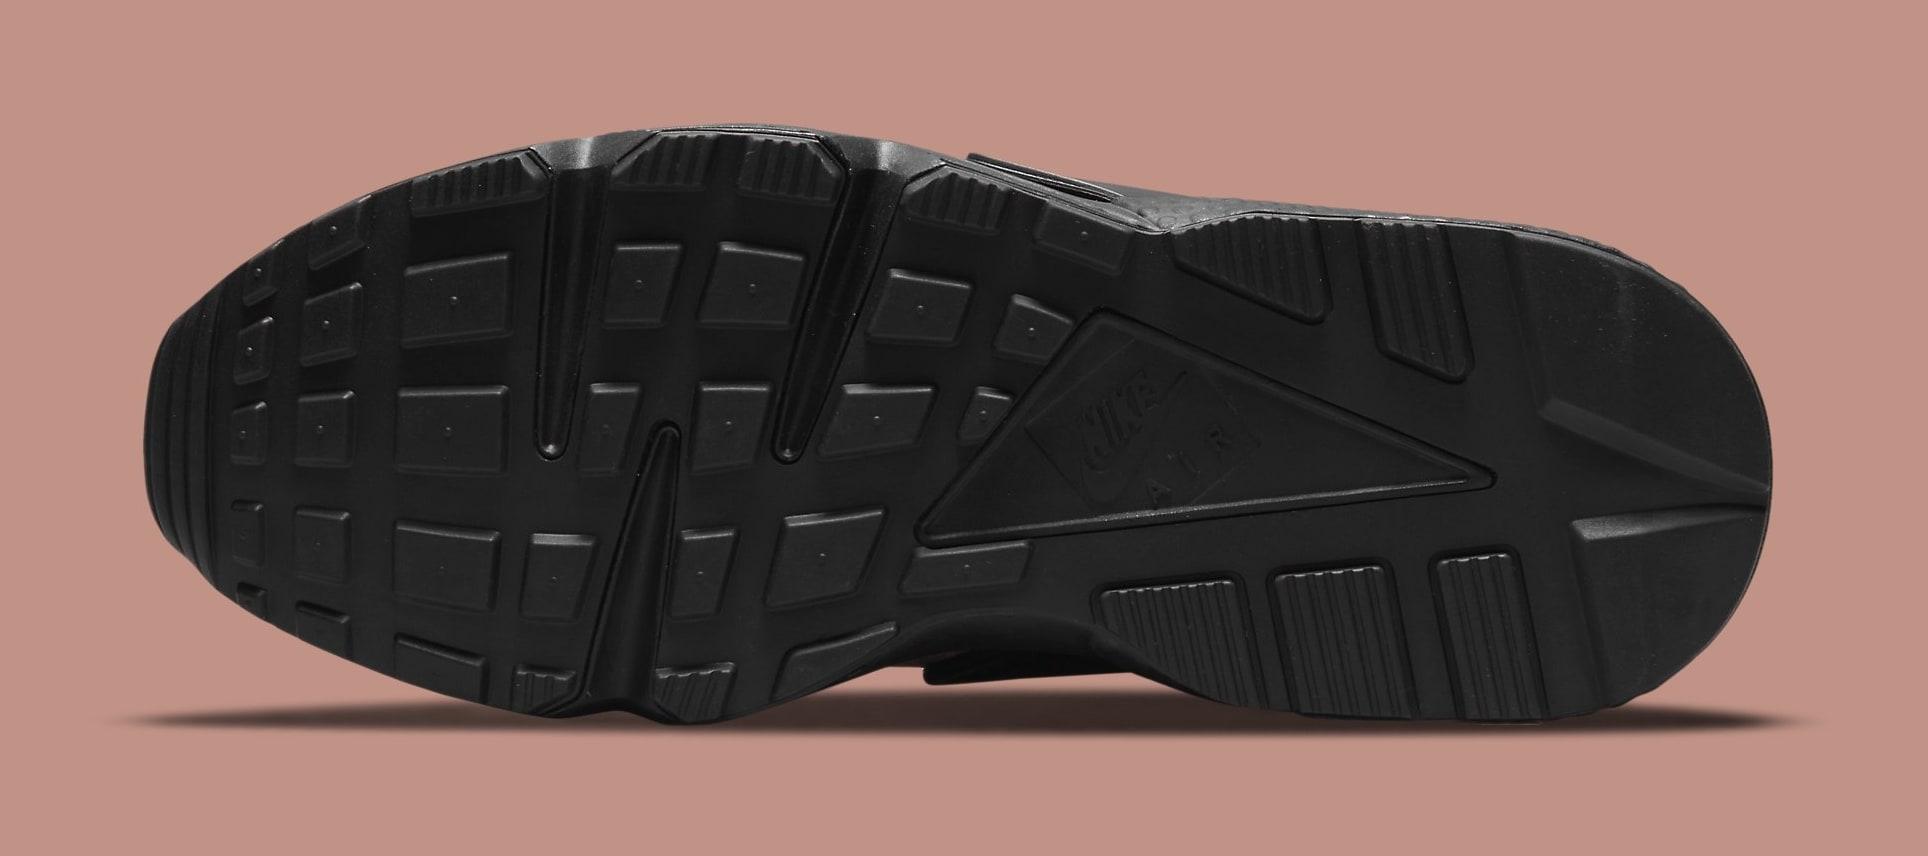 Nike Air Huarache 'Toadstool' DH8143-200 Outsole